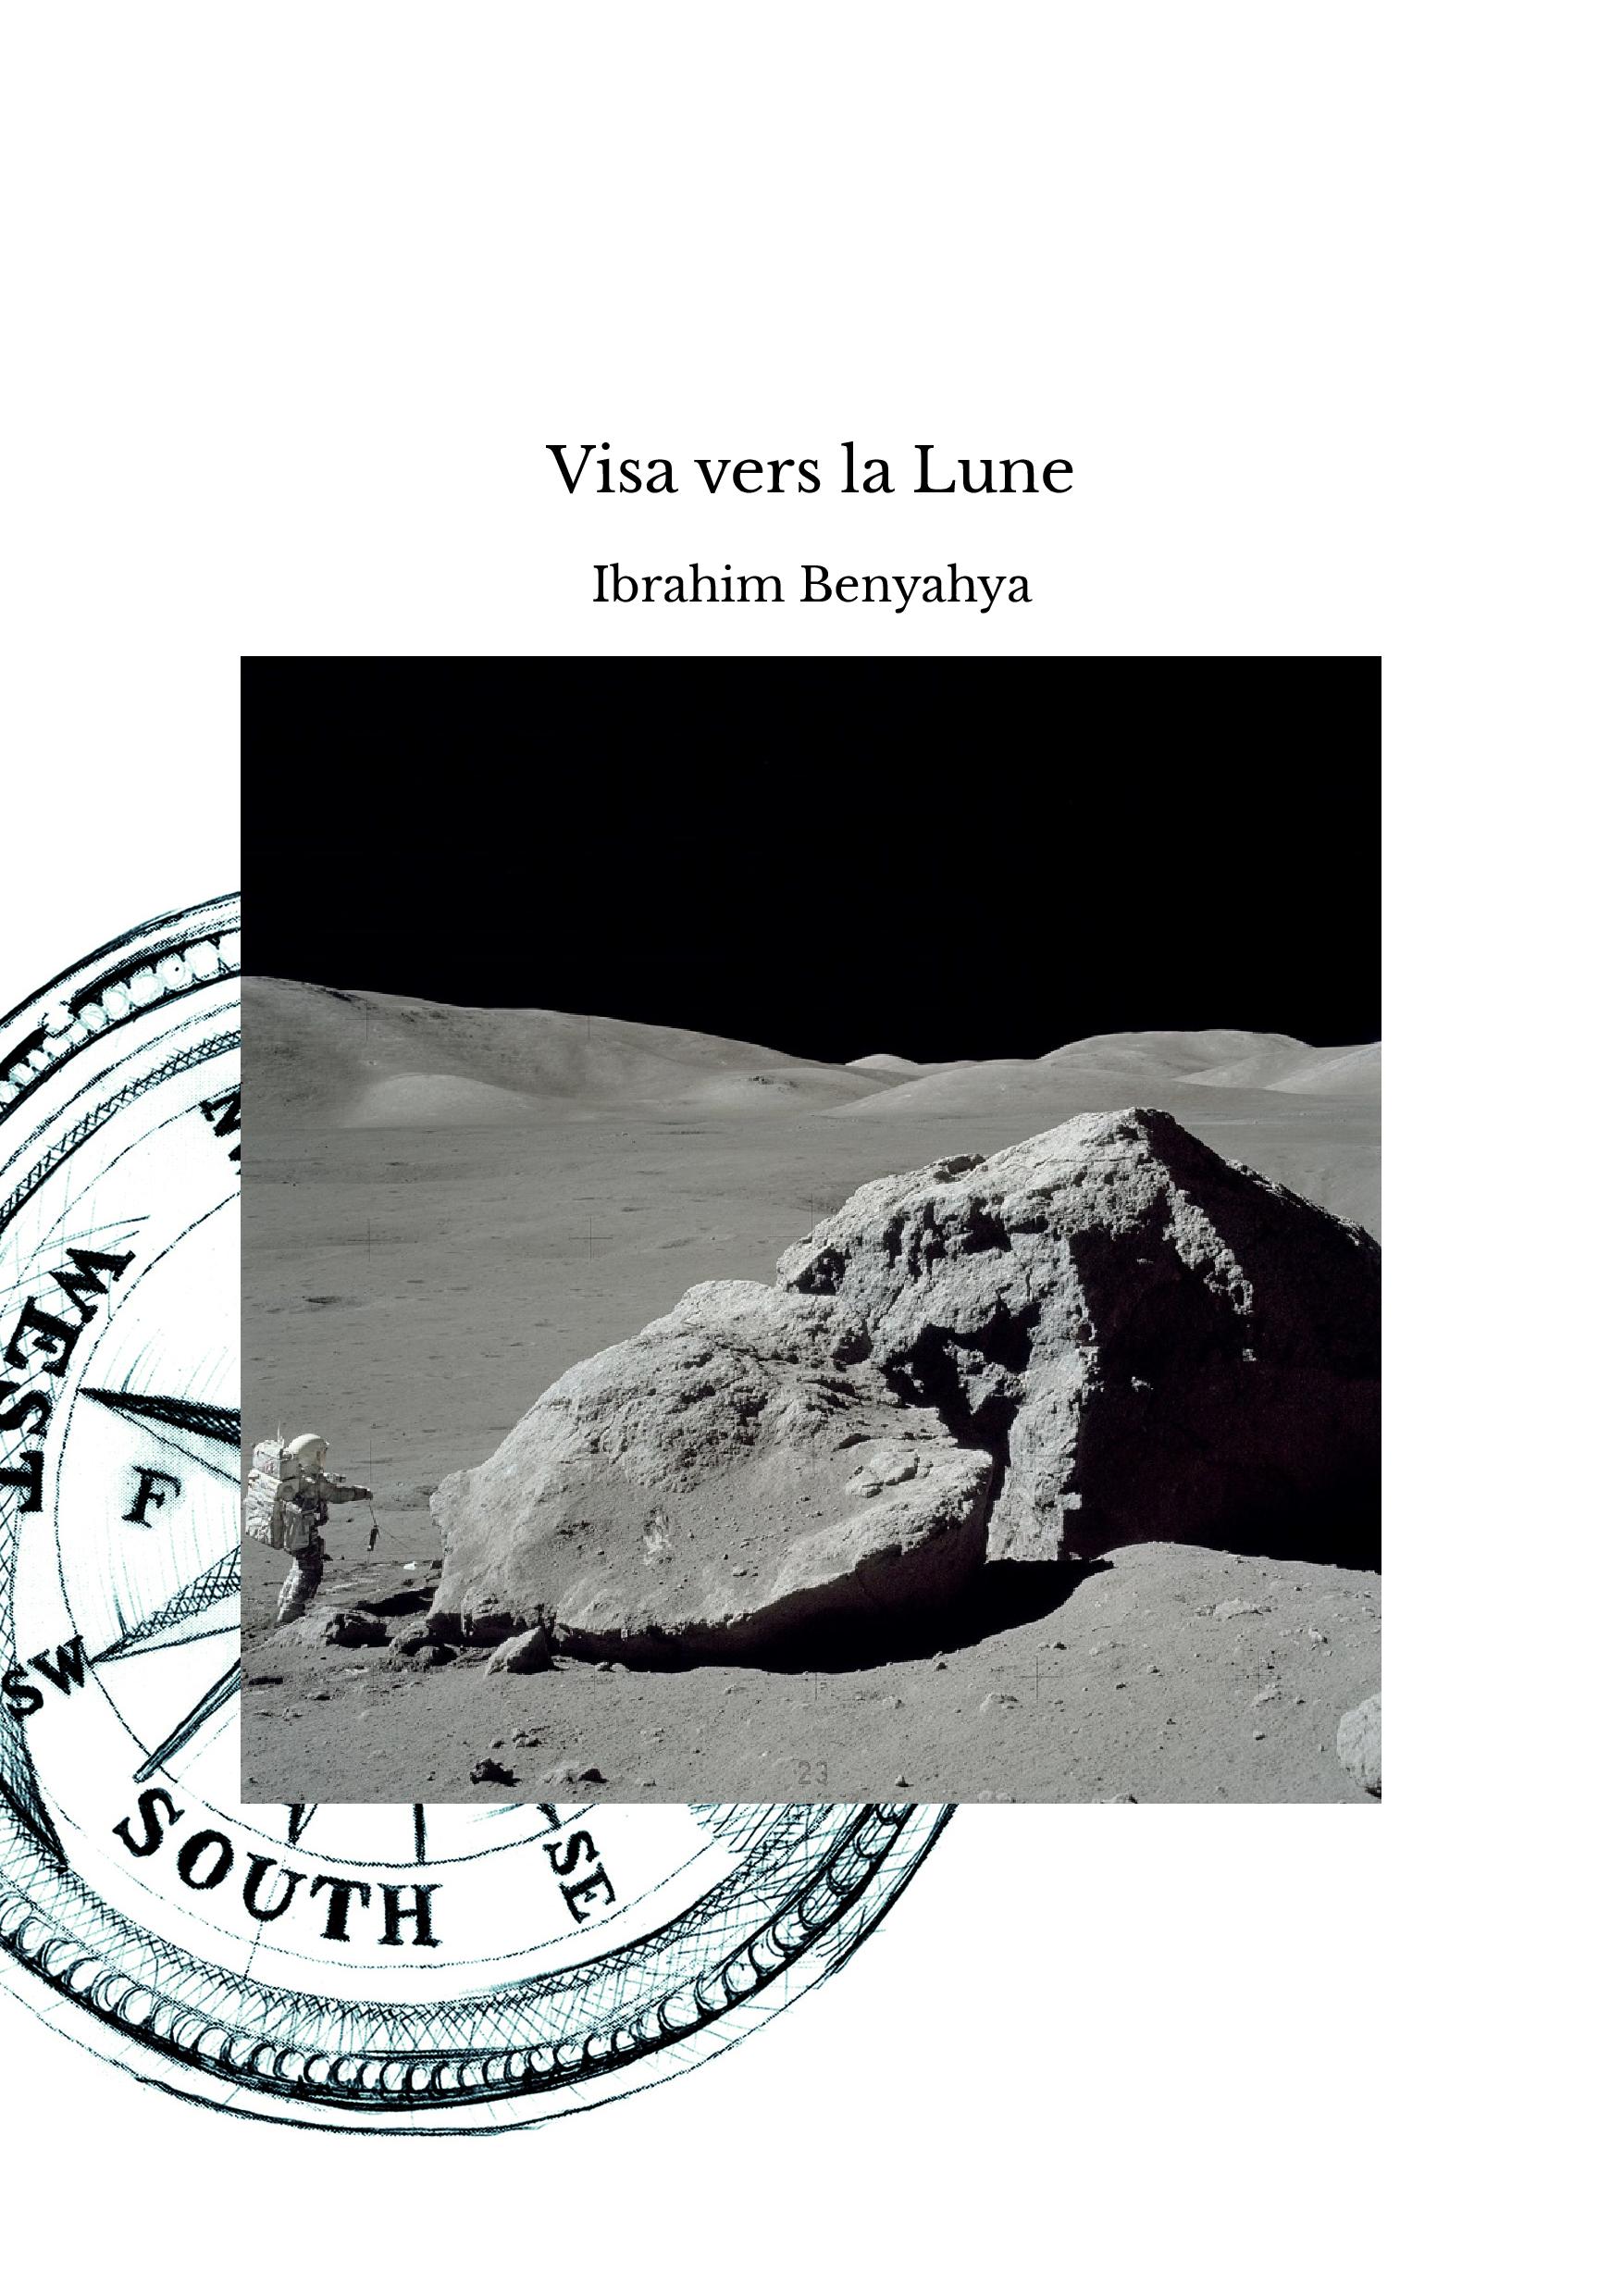 Visa vers la Lune